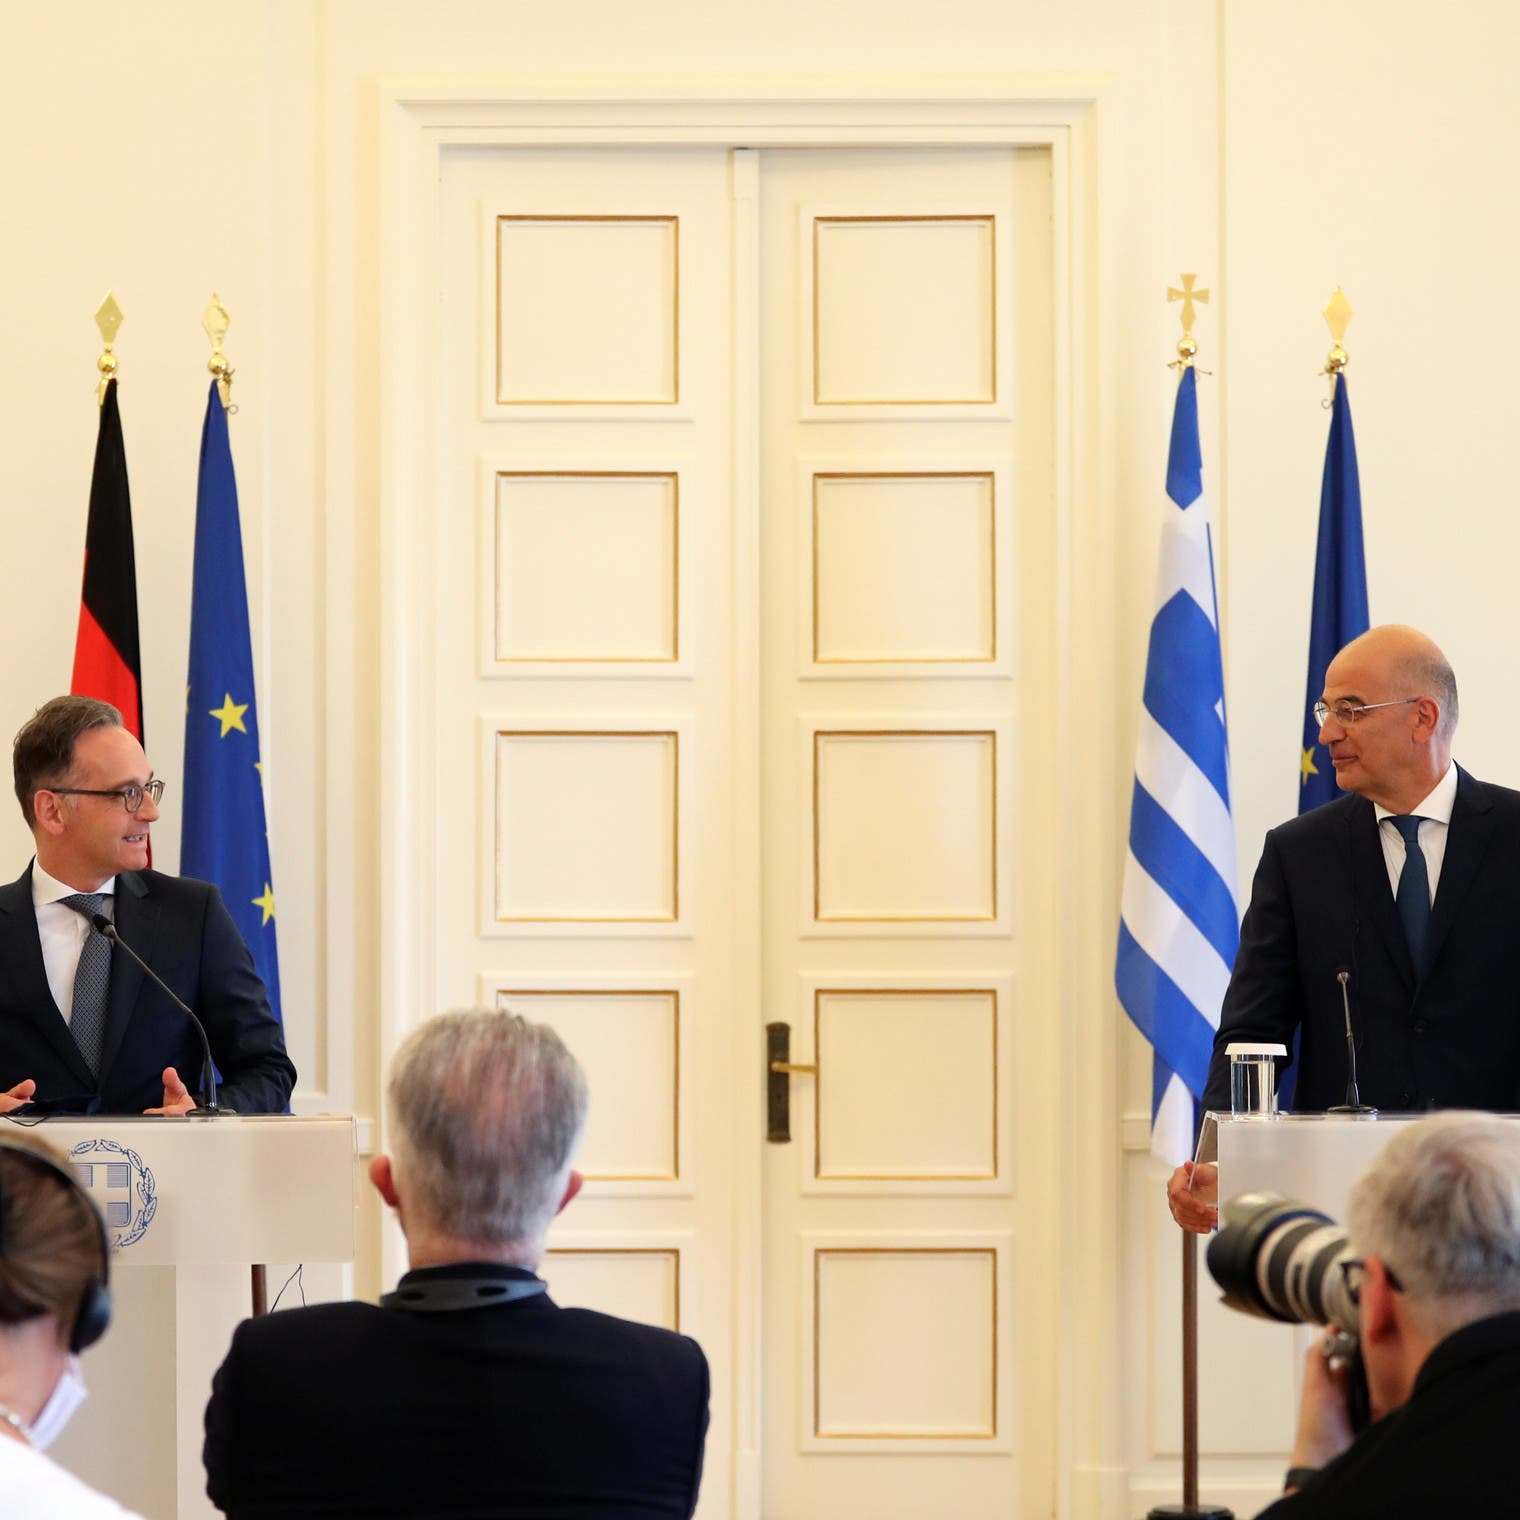 اليونان: سلوك تركيا غير القانوني يهدد تماسك حلف الناتو